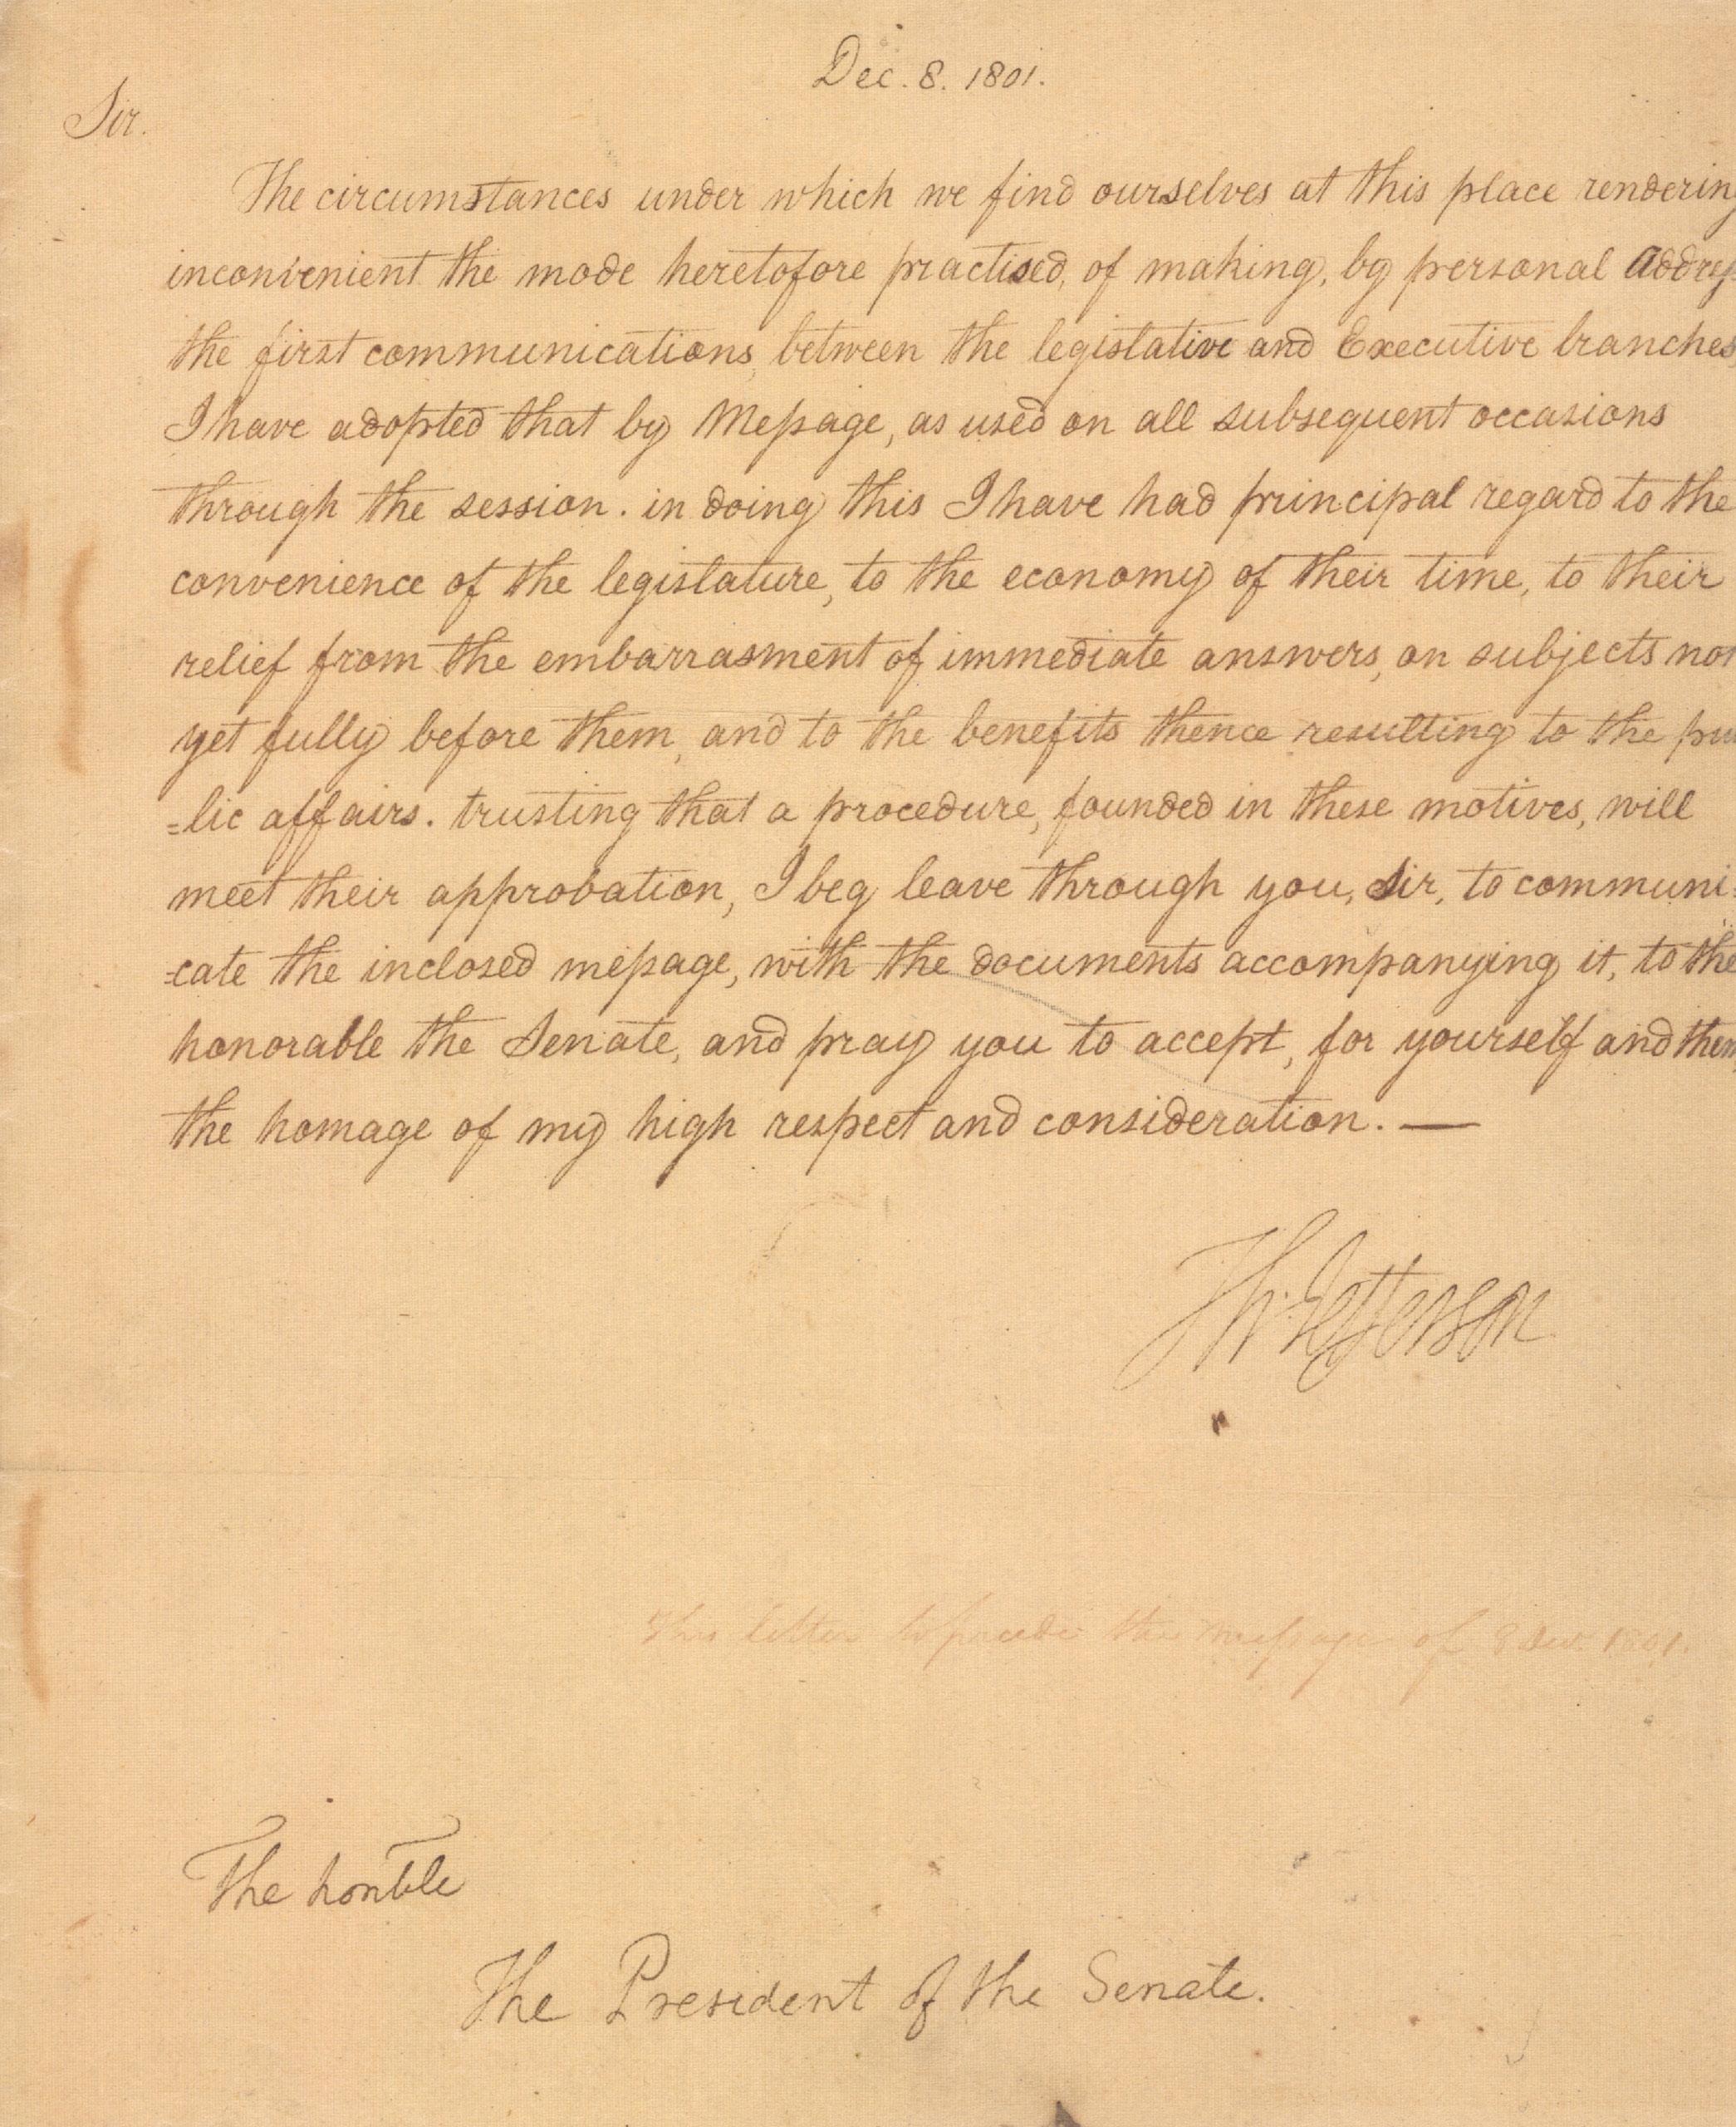 President Thomas Jefferson's letter to the President of the Senate regarding the Annual message, December 8, 1801